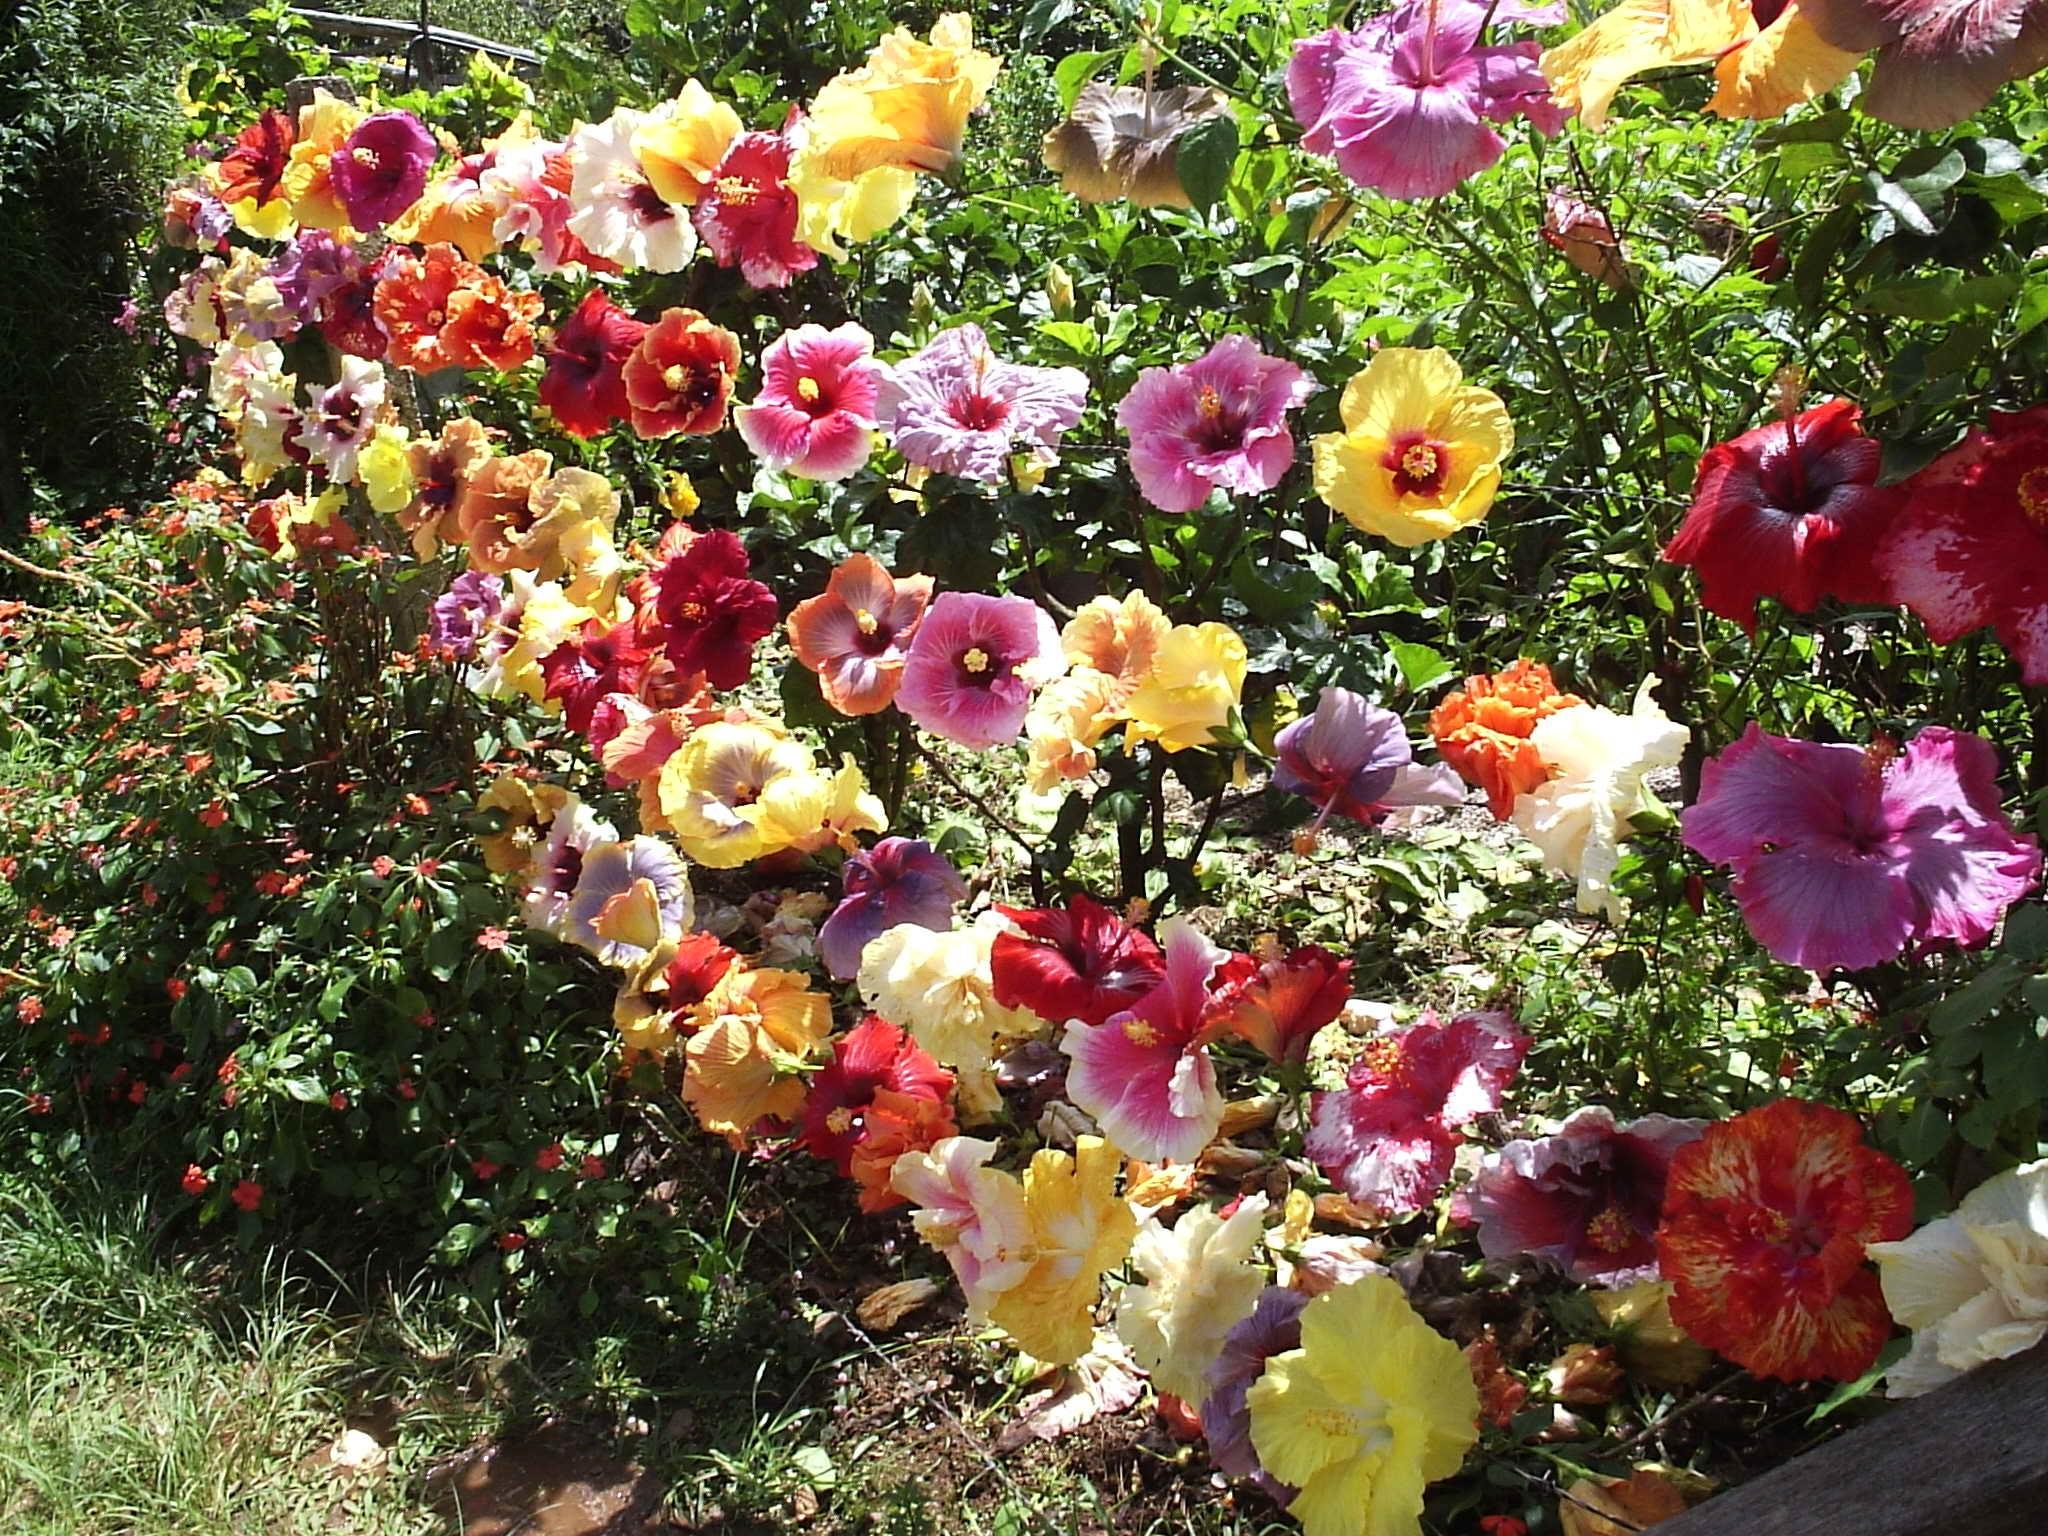 Floral Circulo de Hibiscos Florais Filhas de Gaia